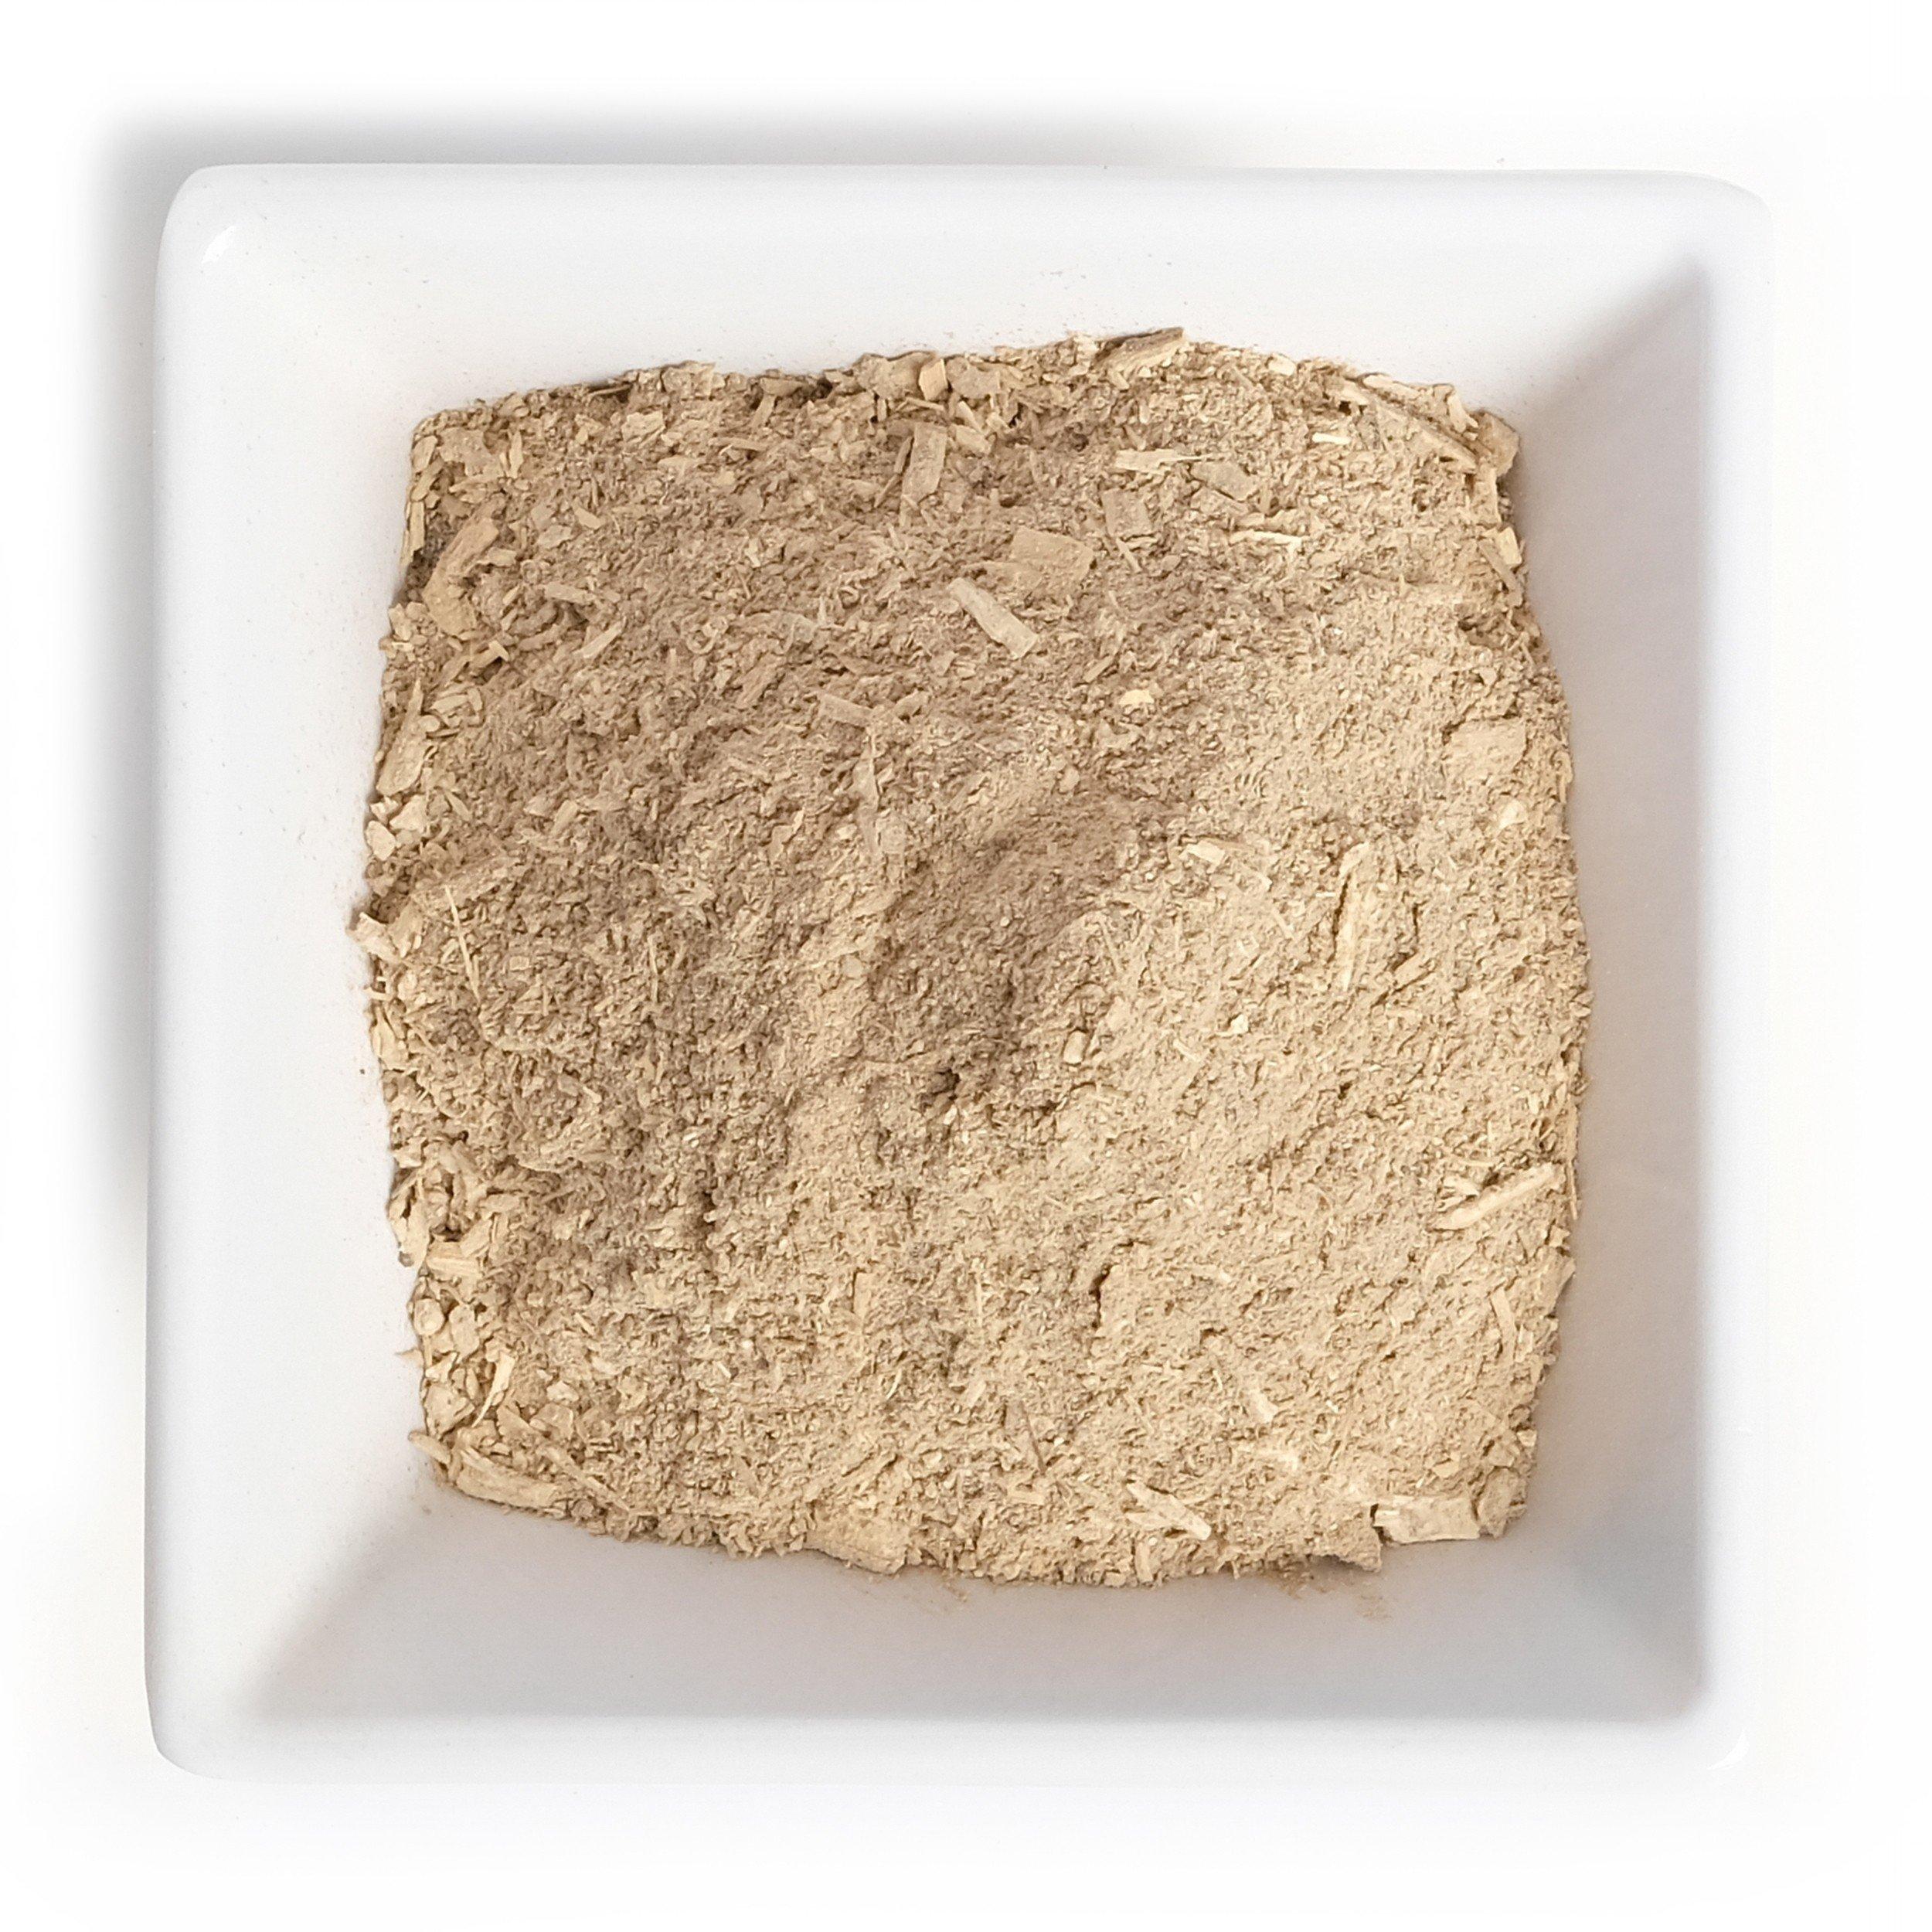 Tanna Kava (Kaollik) Powder